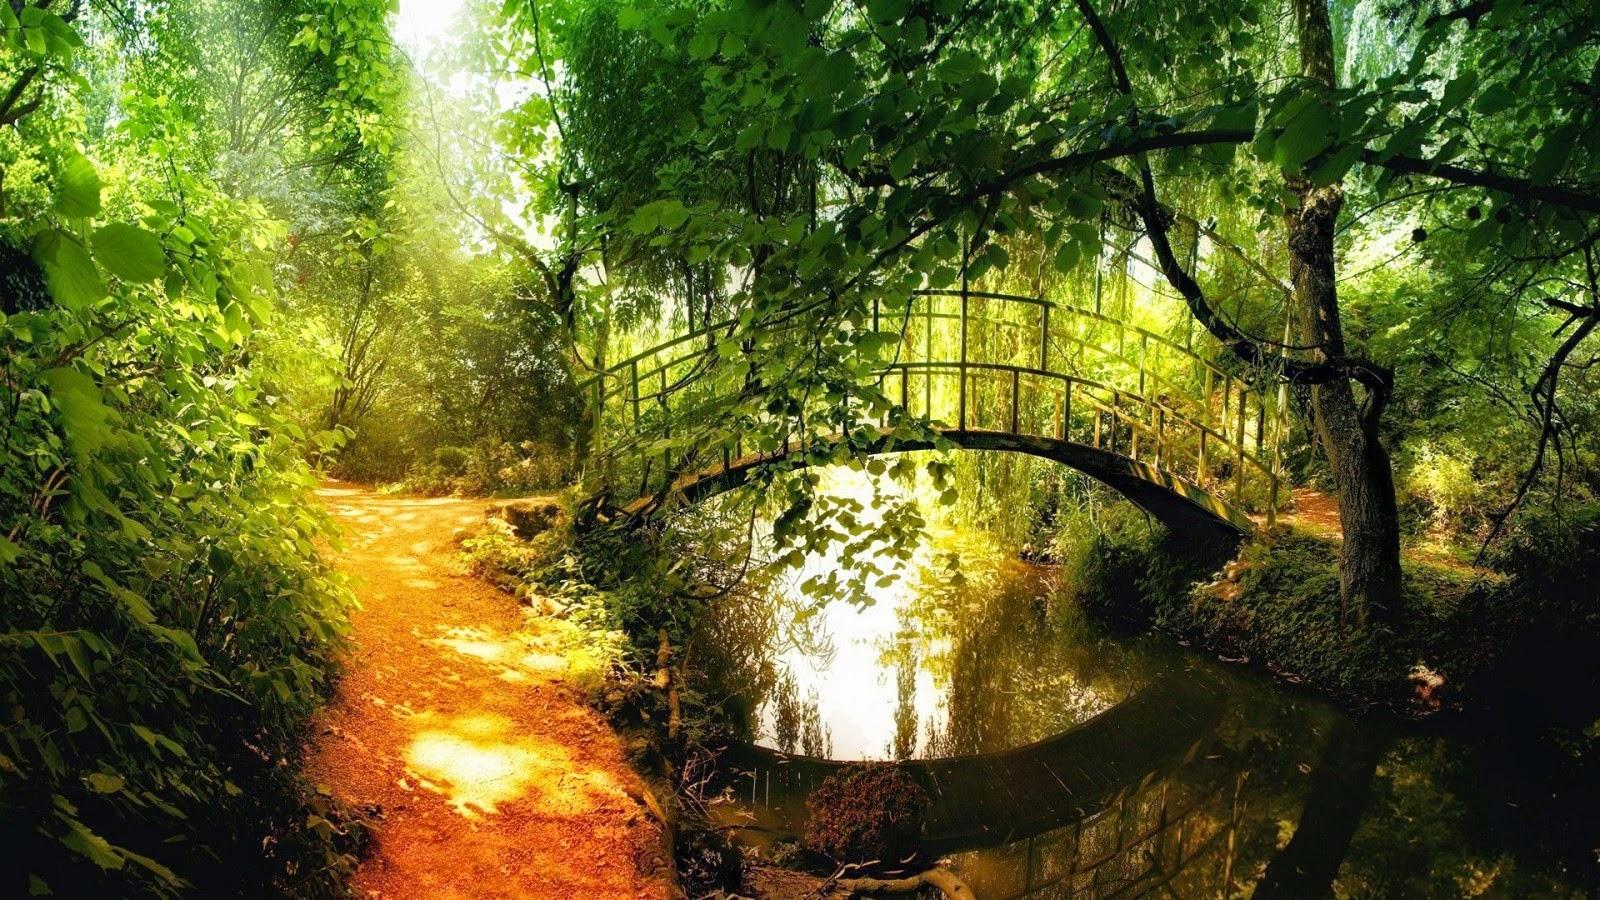 4k Fall Painting Wallpapers Nature Bridge Hd Nature Wallpapers